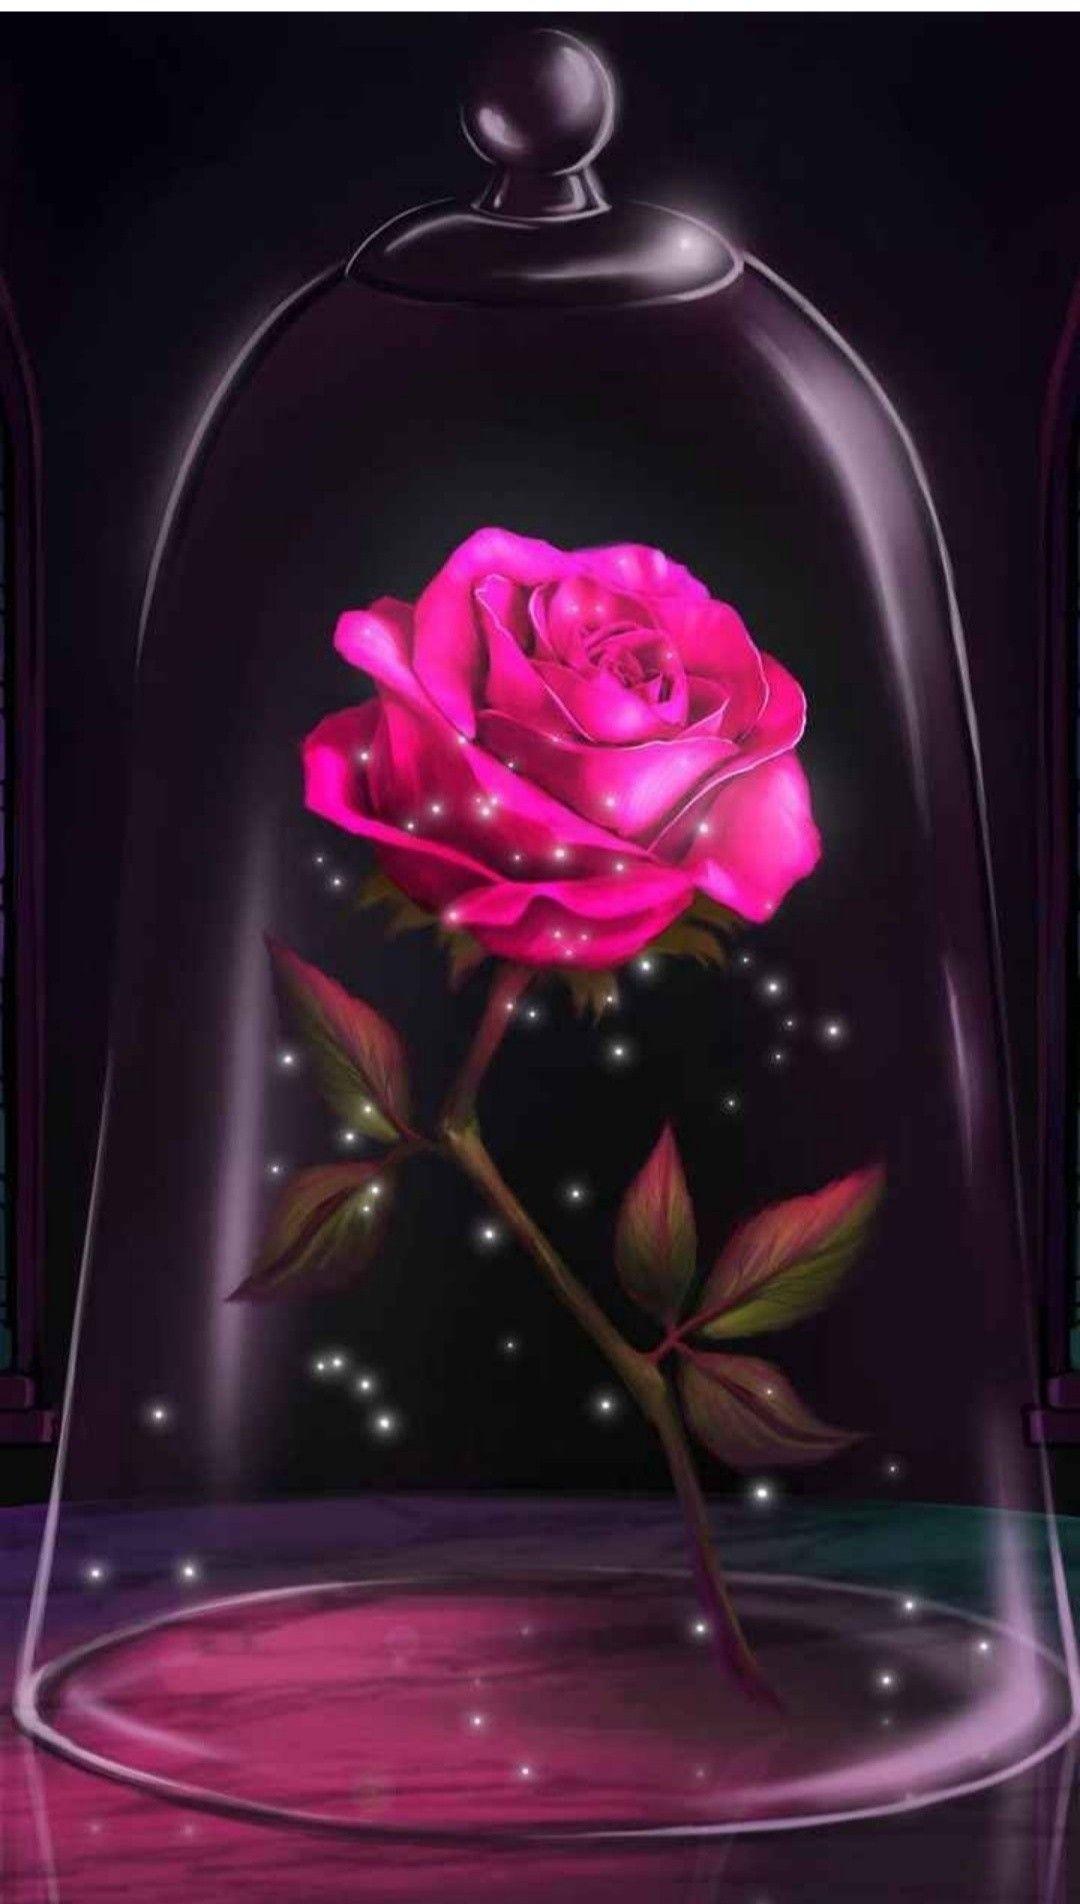 Pin By Nana On Rose Rose Wallpaper Enchanted Rose Beast Wallpaper